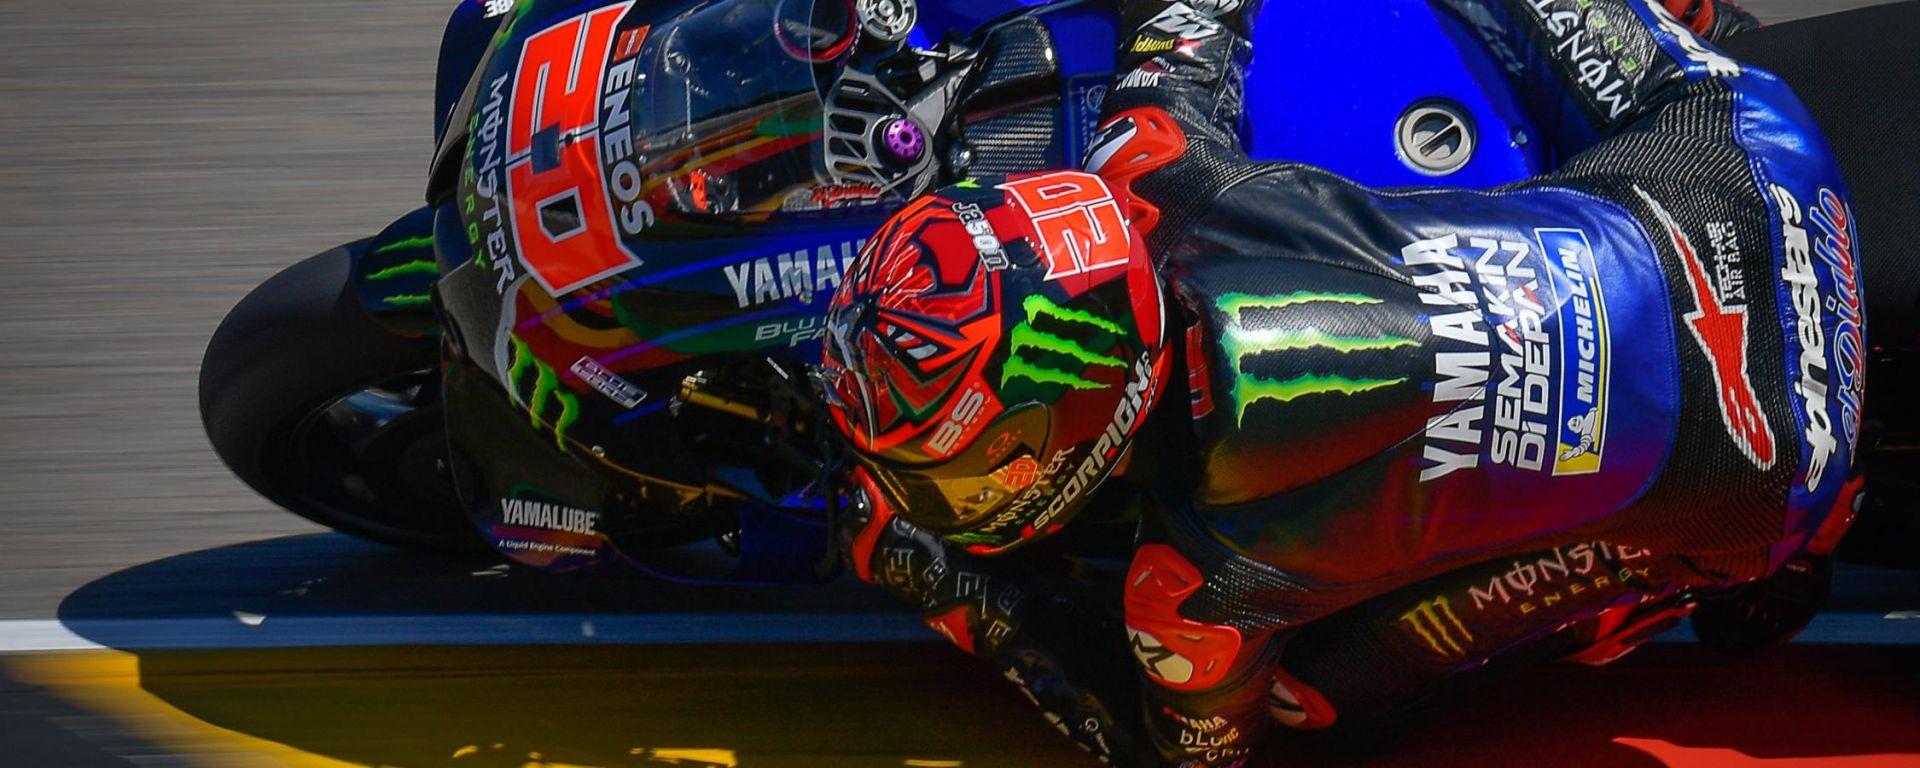 MotoGP Germania 2021, Sachsenring: Fabio Quartararo (Yamaha)